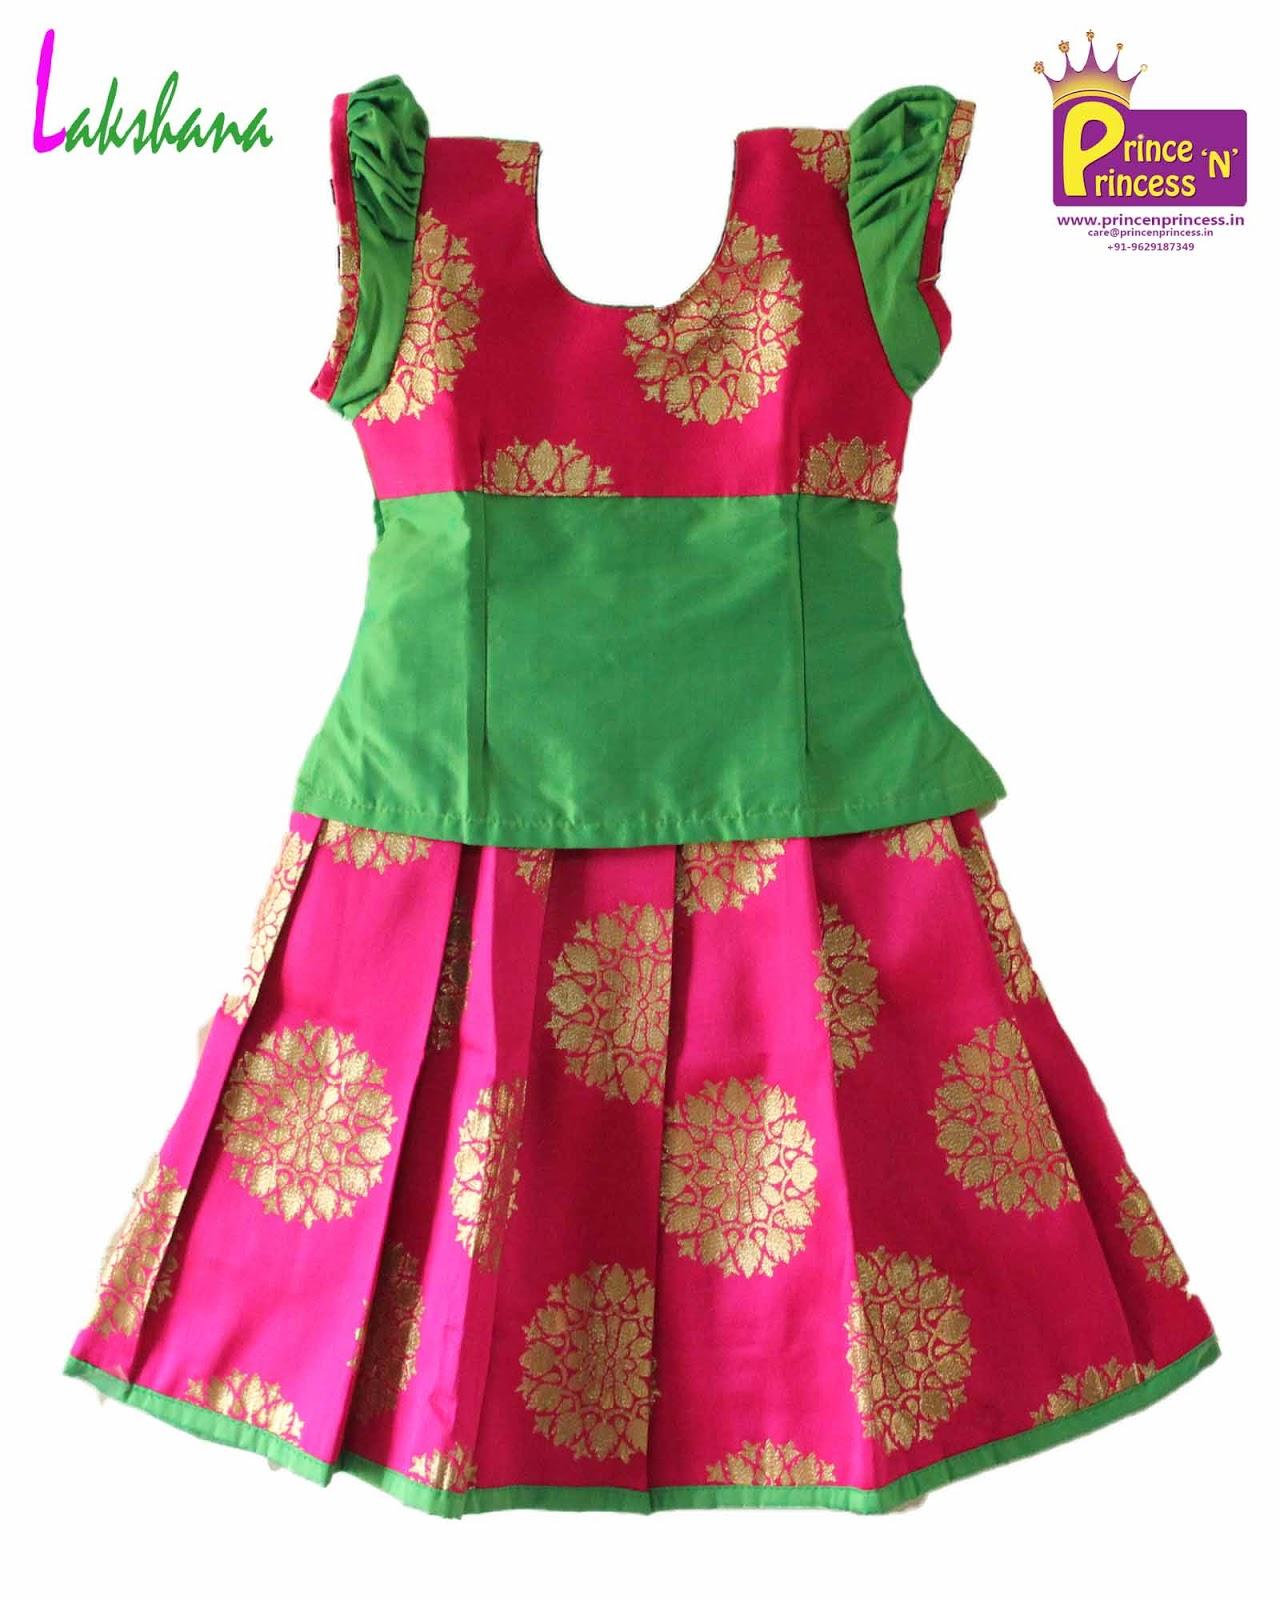 25af31ef7f5ef Prince N Princess  Grand Kids Traditional Pattu Pavadai